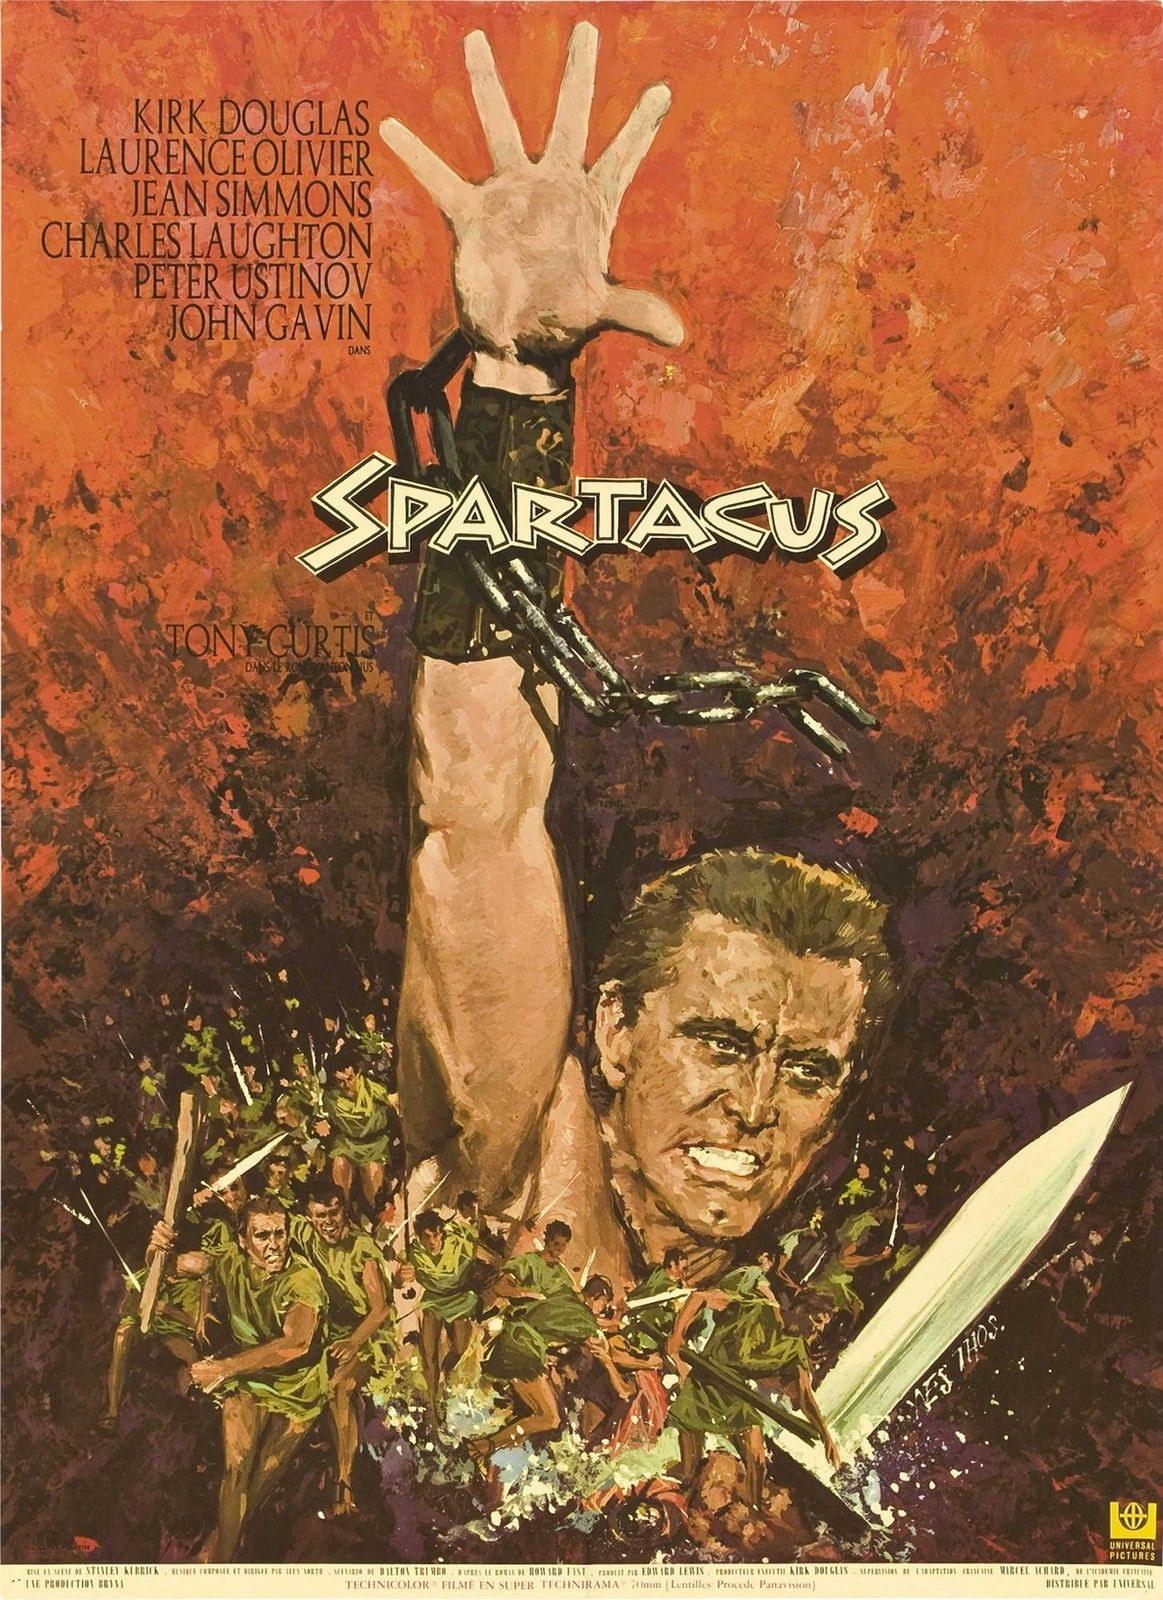 74063-SPARTACUS-1960-Stanley-Kubrick-Lawrence-Olivier-FRAMED-CANVAS-PRINT-Toile